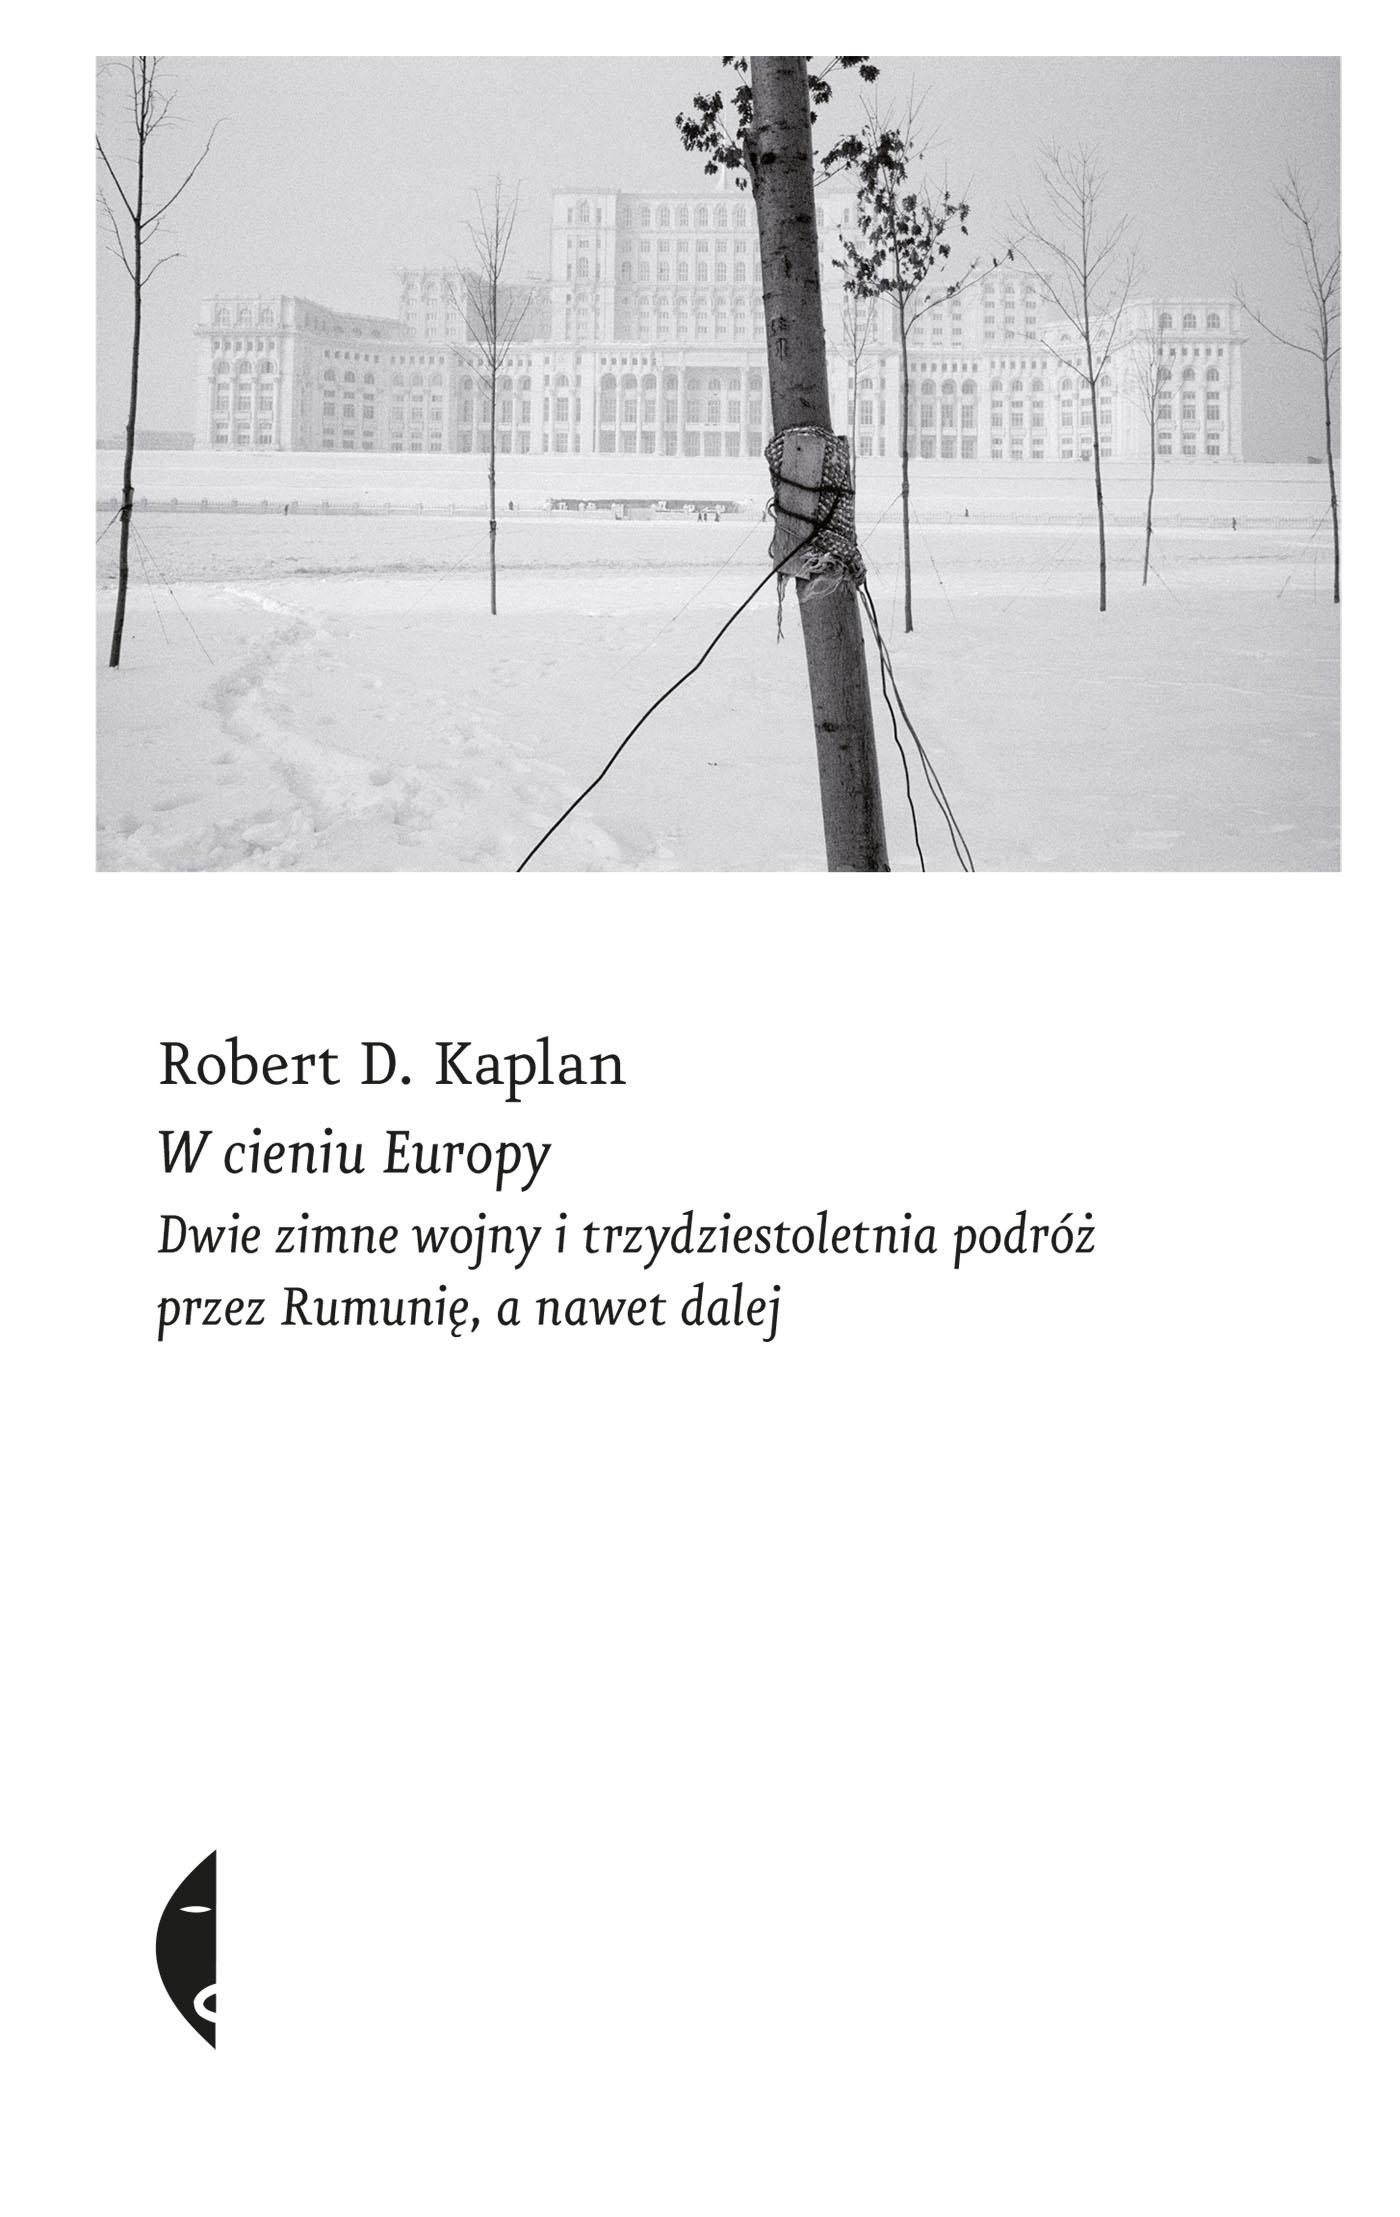 Robert D. Kaplan W cieniu Europy цена и фото